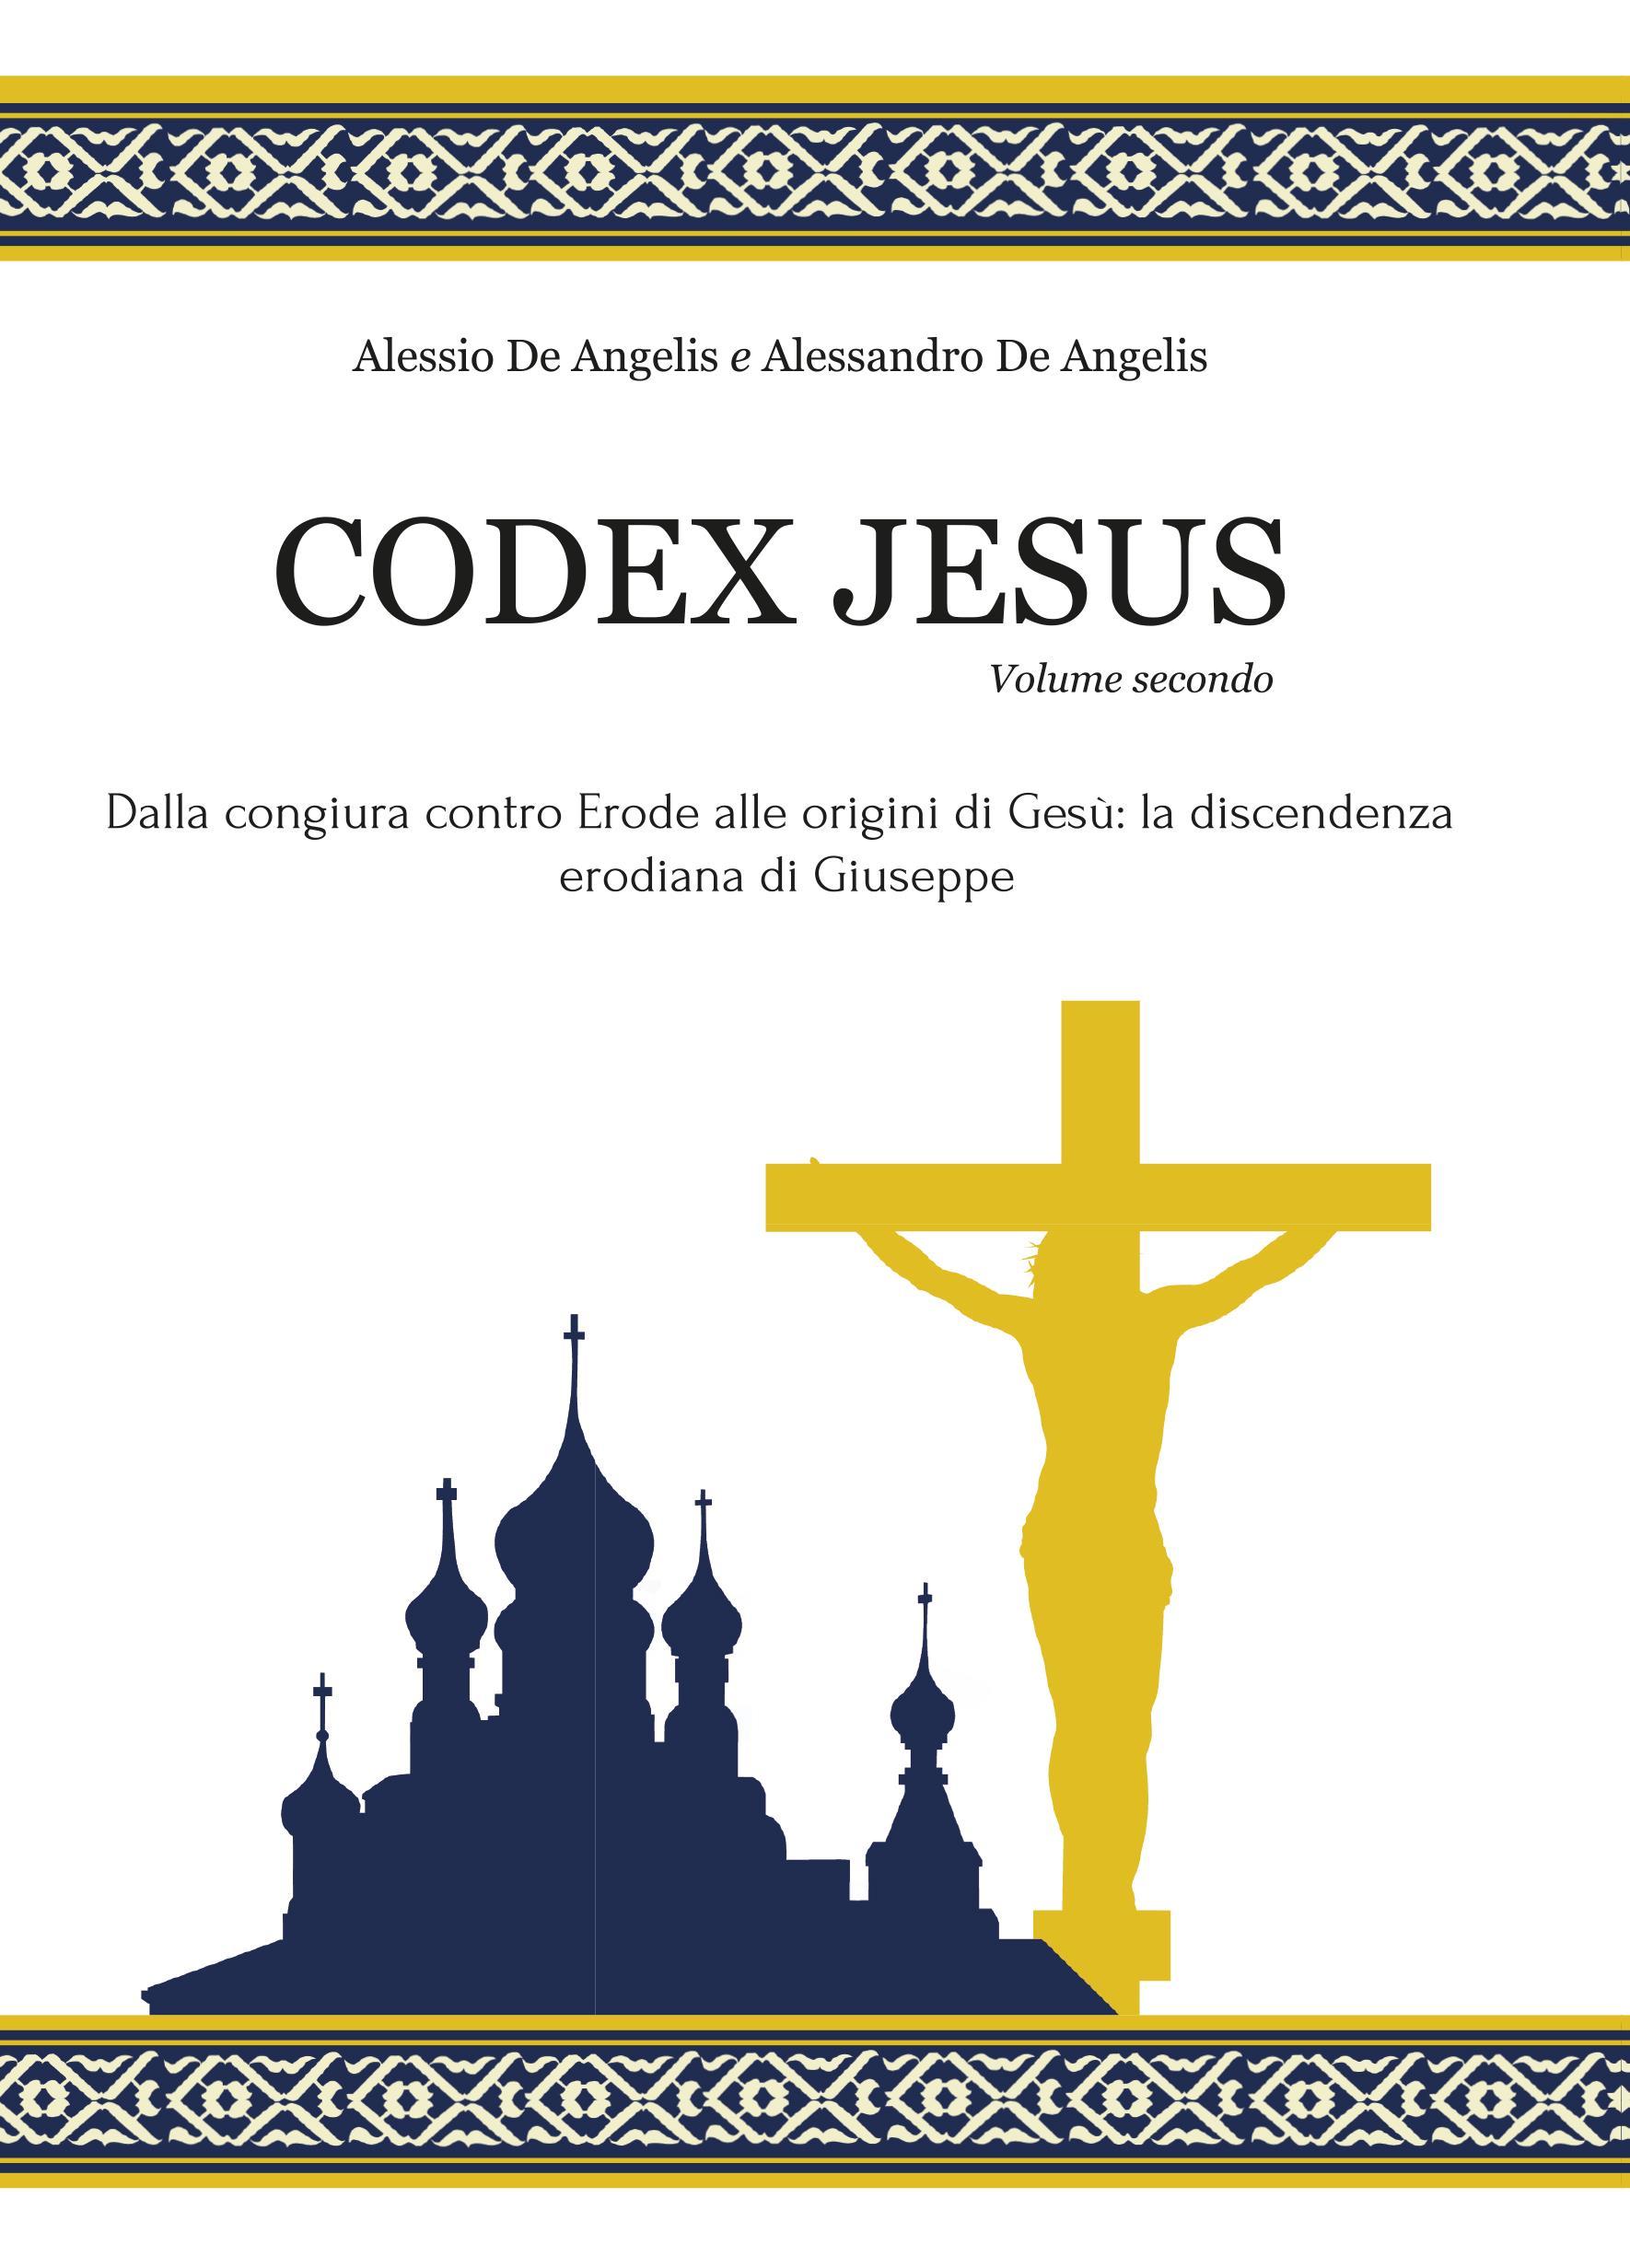 Codex Jesus II